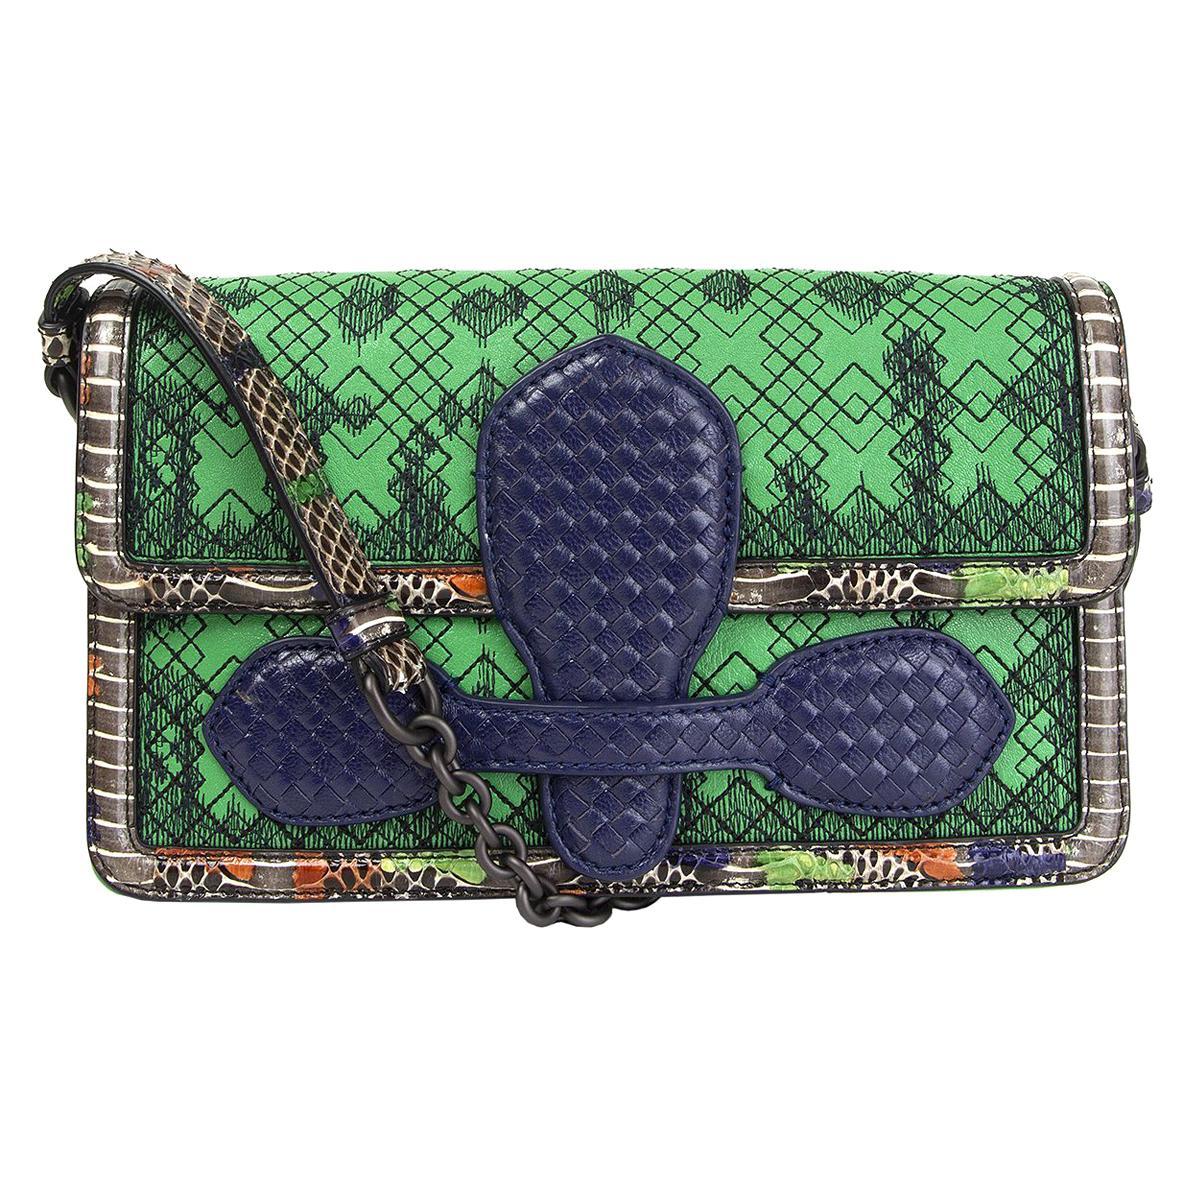 BOTTEGA VENETA green & purple leather IRISH MADRAS Shoulder Bag